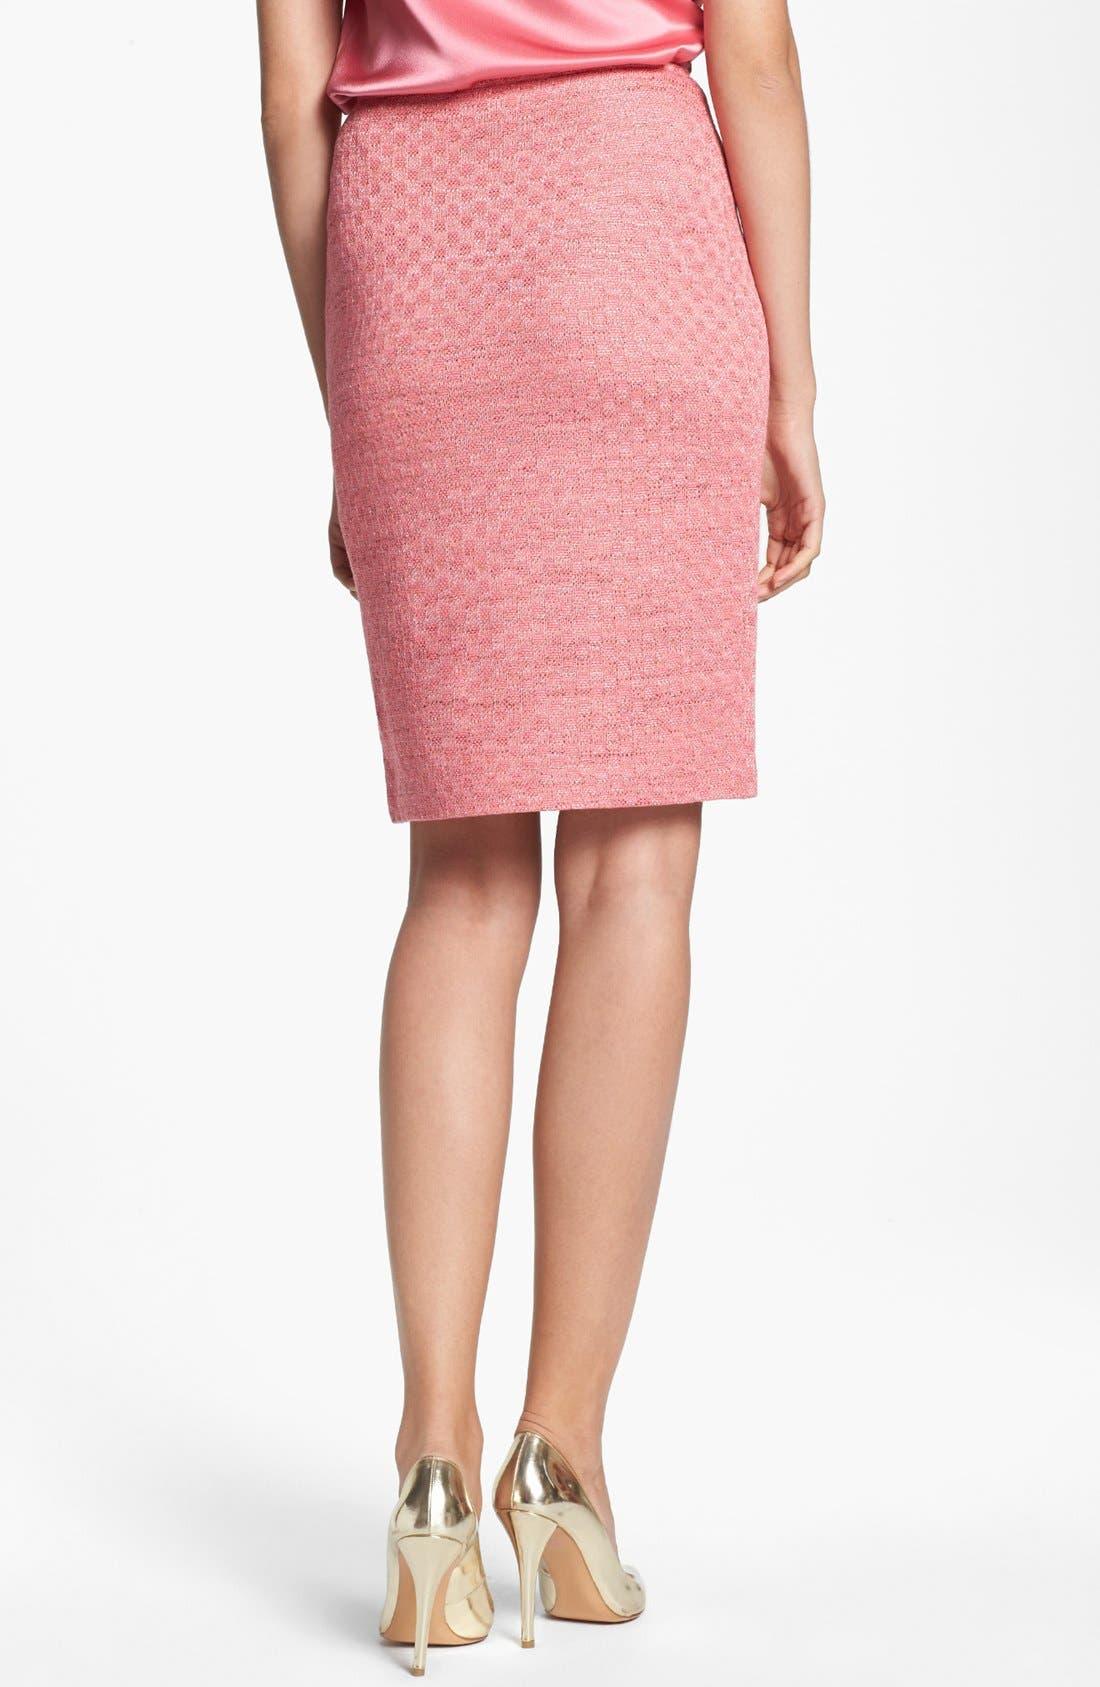 ST. JOHN COLLECTION, Damier Knit Pencil Skirt, Alternate thumbnail 4, color, 950